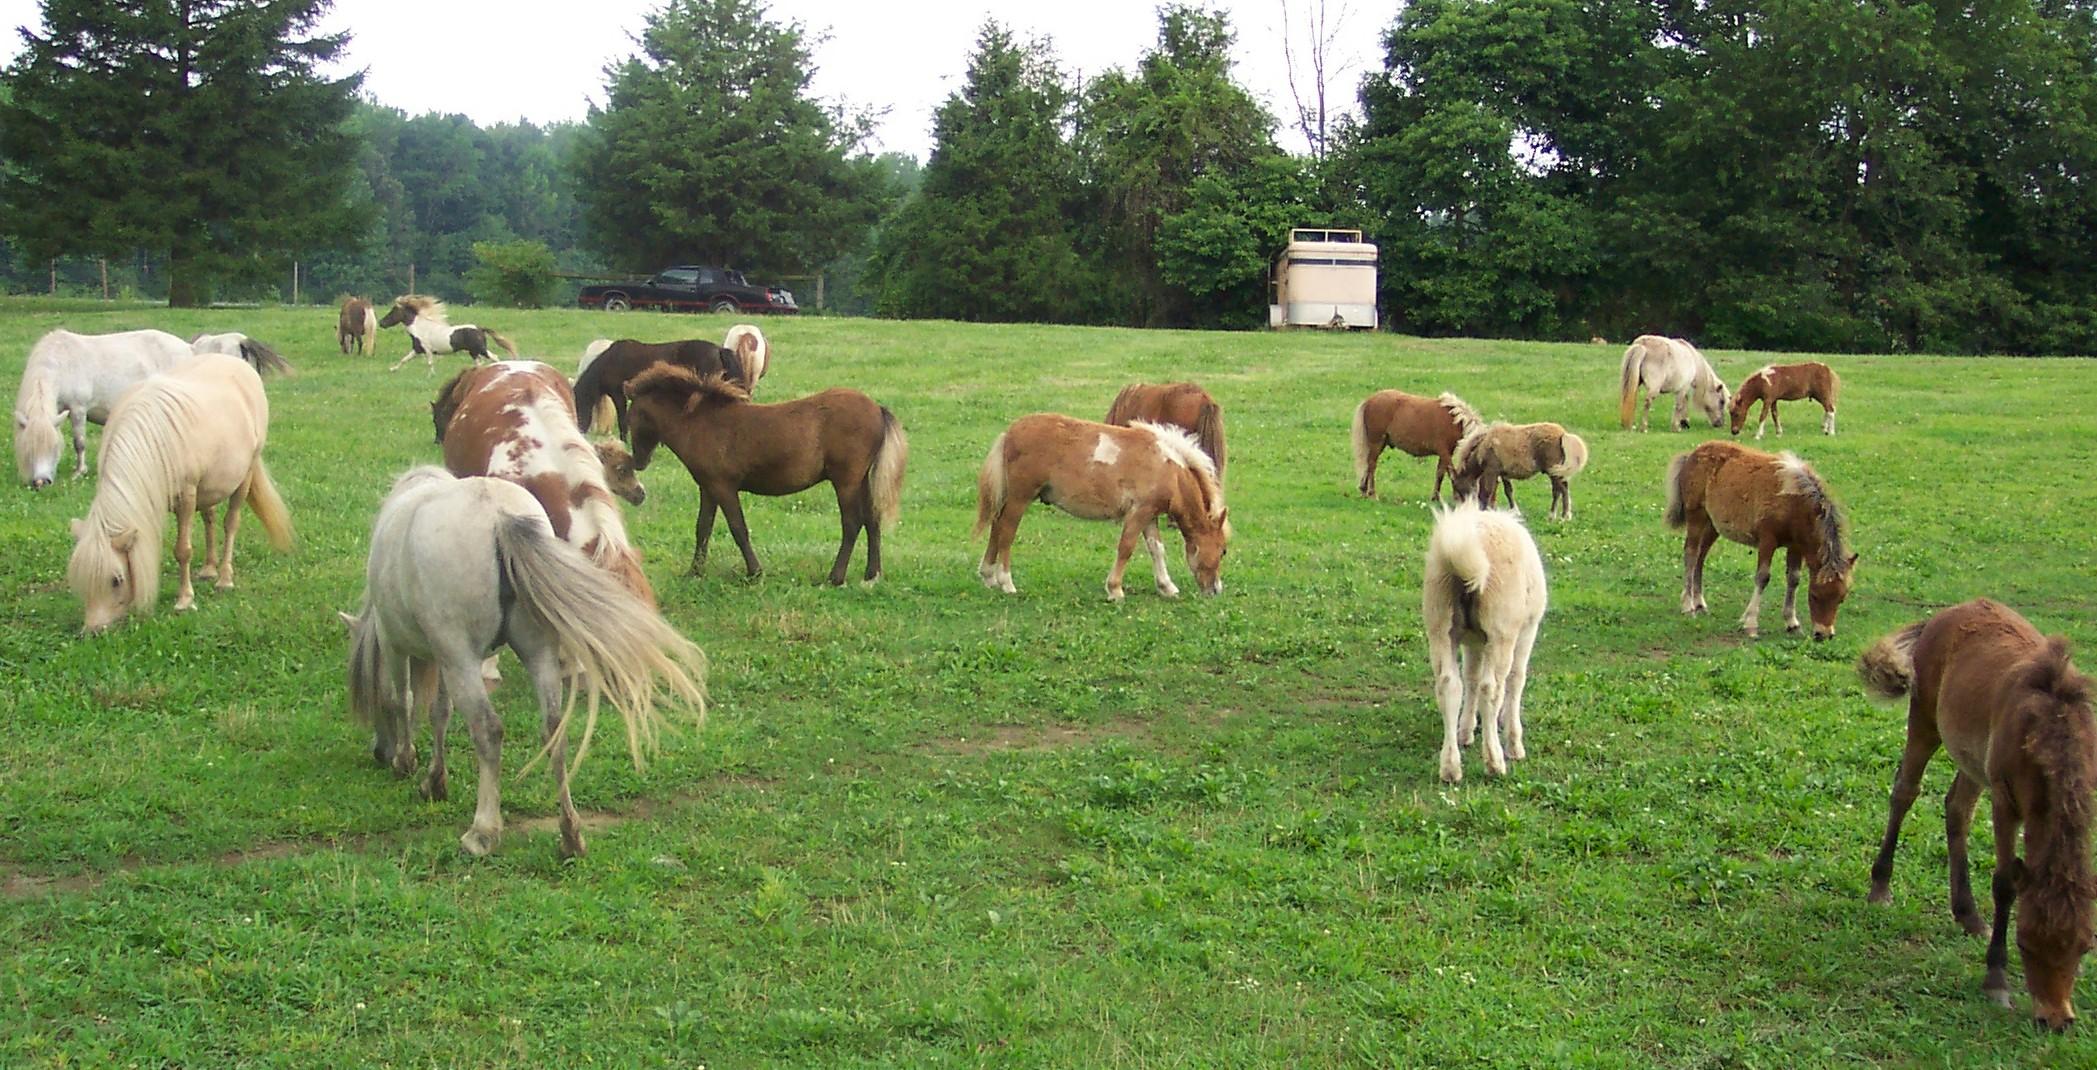 Magic stars miniature horse farm for Horse farm